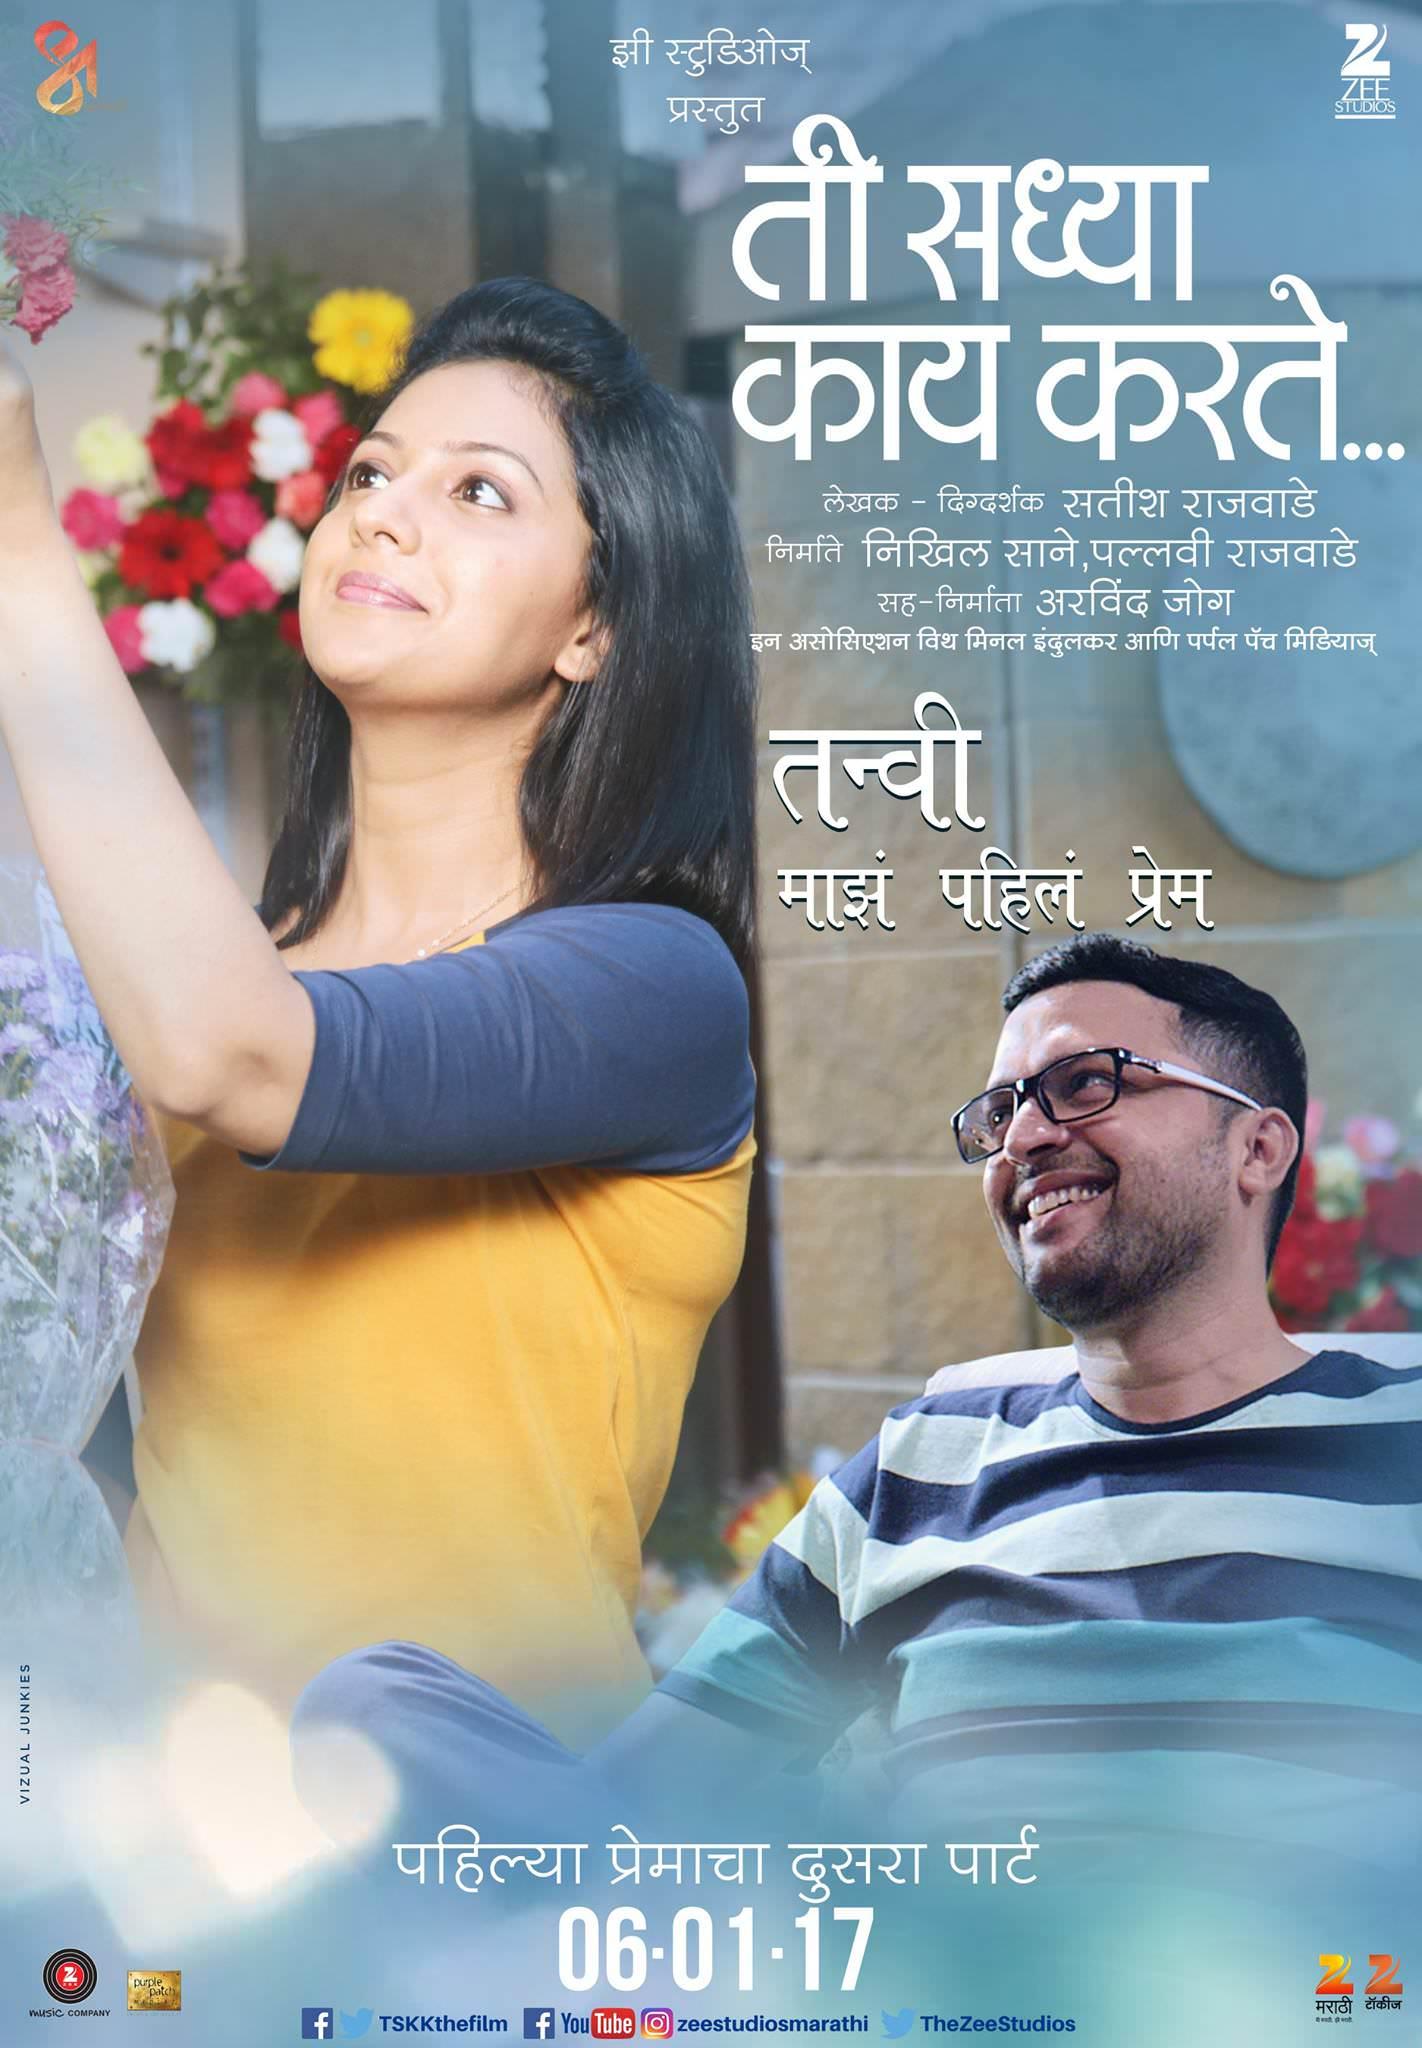 Ti Saddhya Kay Karte Movie Download in HD - movierias.net